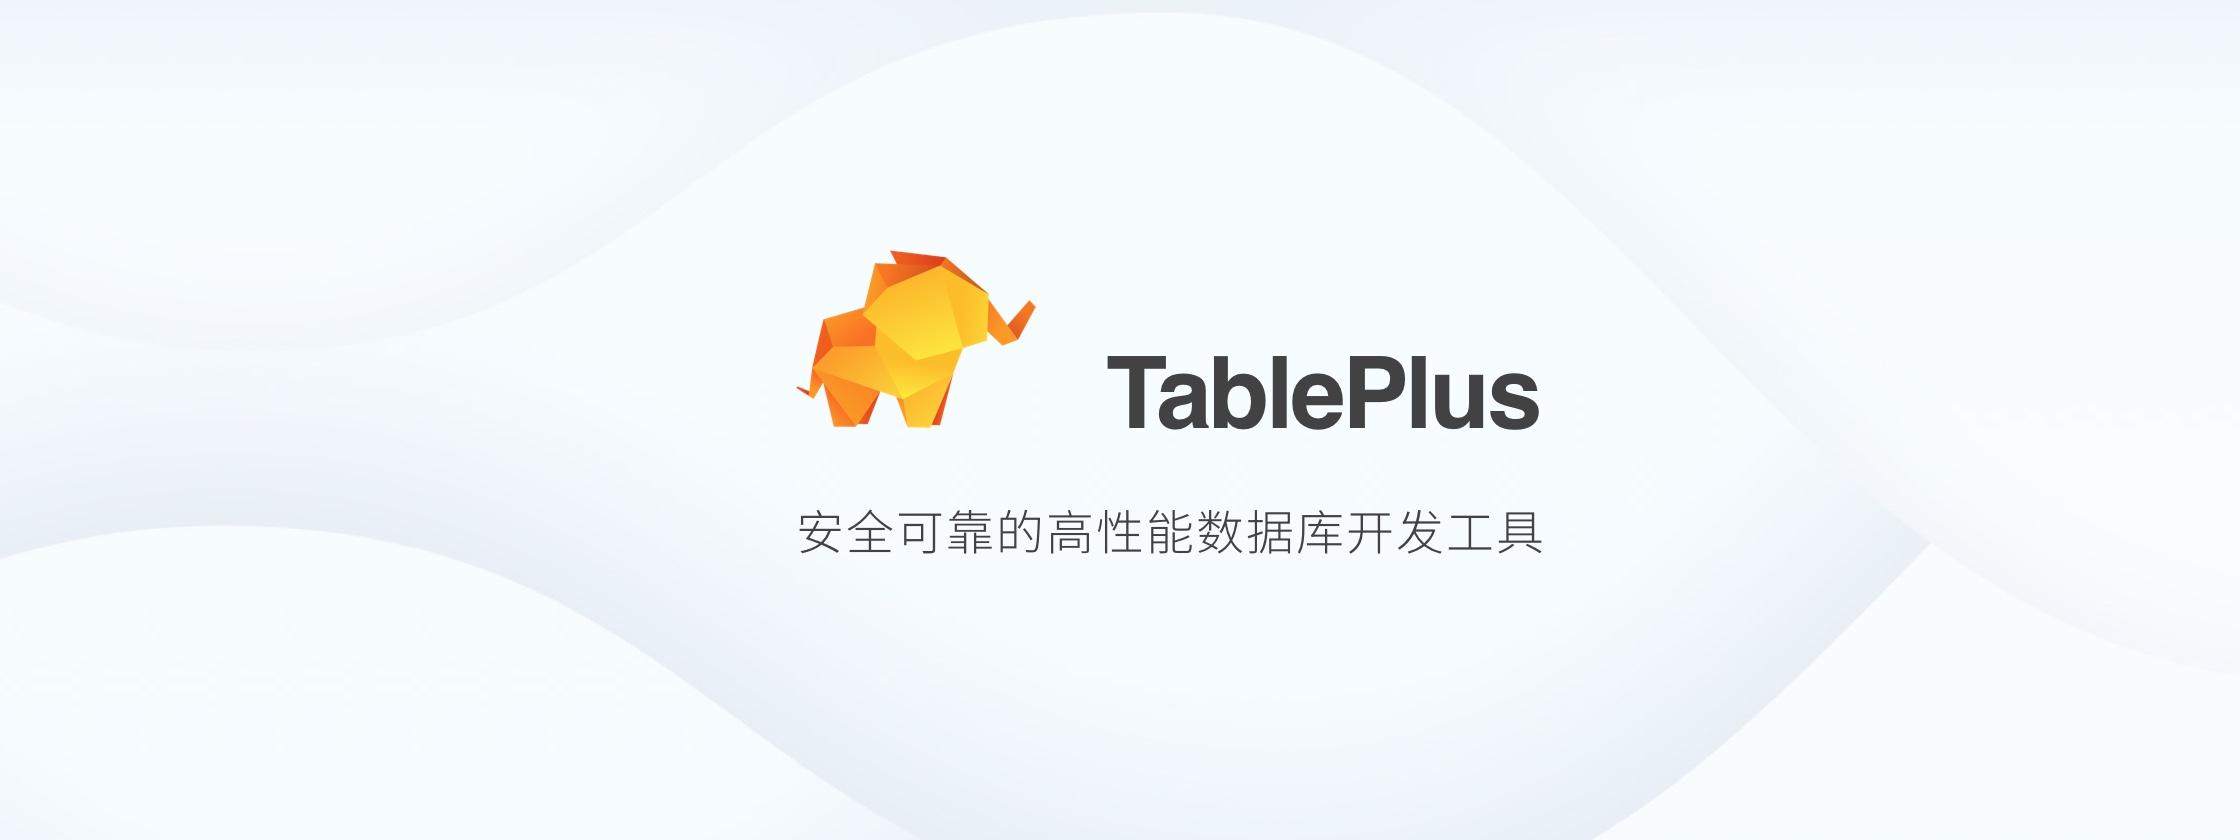 TablePlus,安全可靠的高性能数据库开发工具